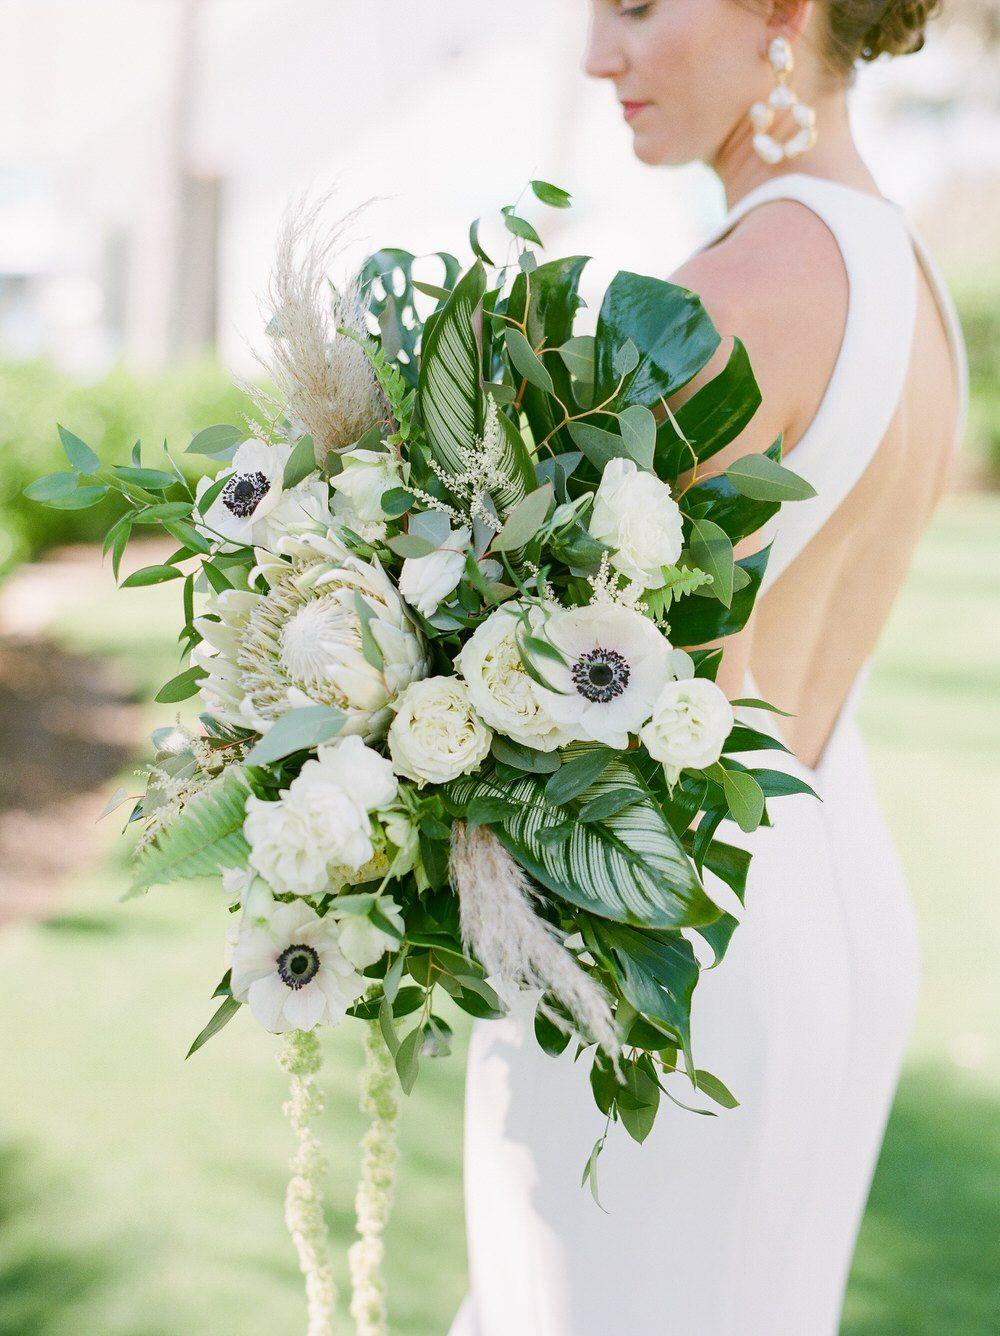 Tropical Chic Florida Wedding With A Massive Palm Leaf Bouquet